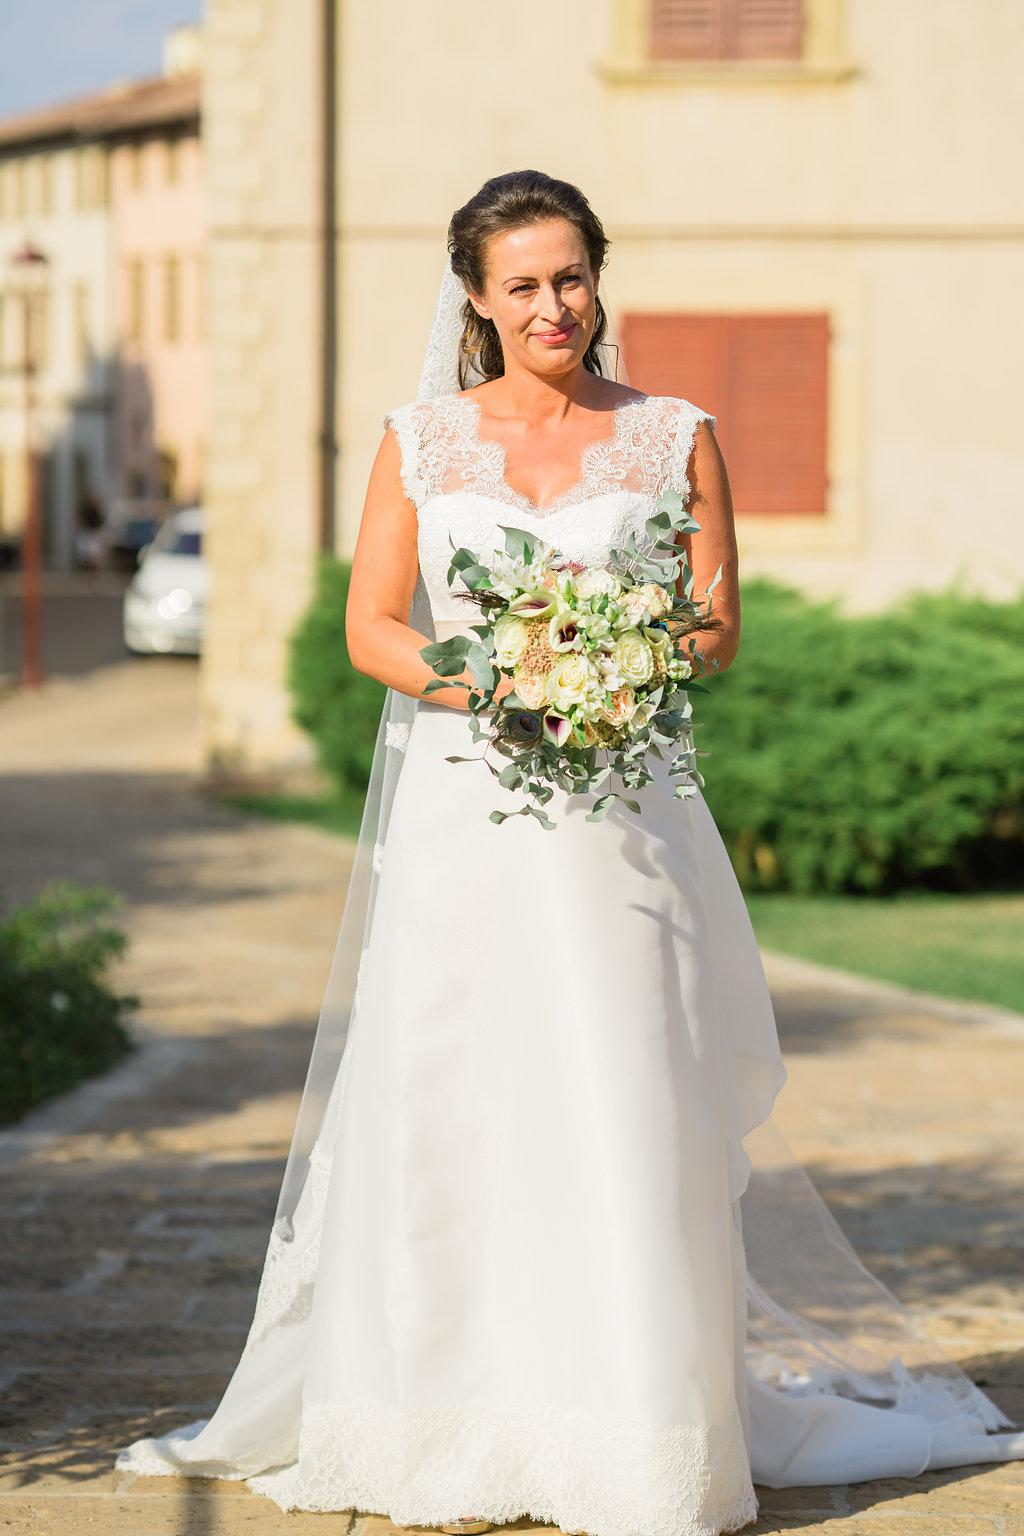 castelfalfi-tuscany-wedding-photographer-roberta-facchini-146